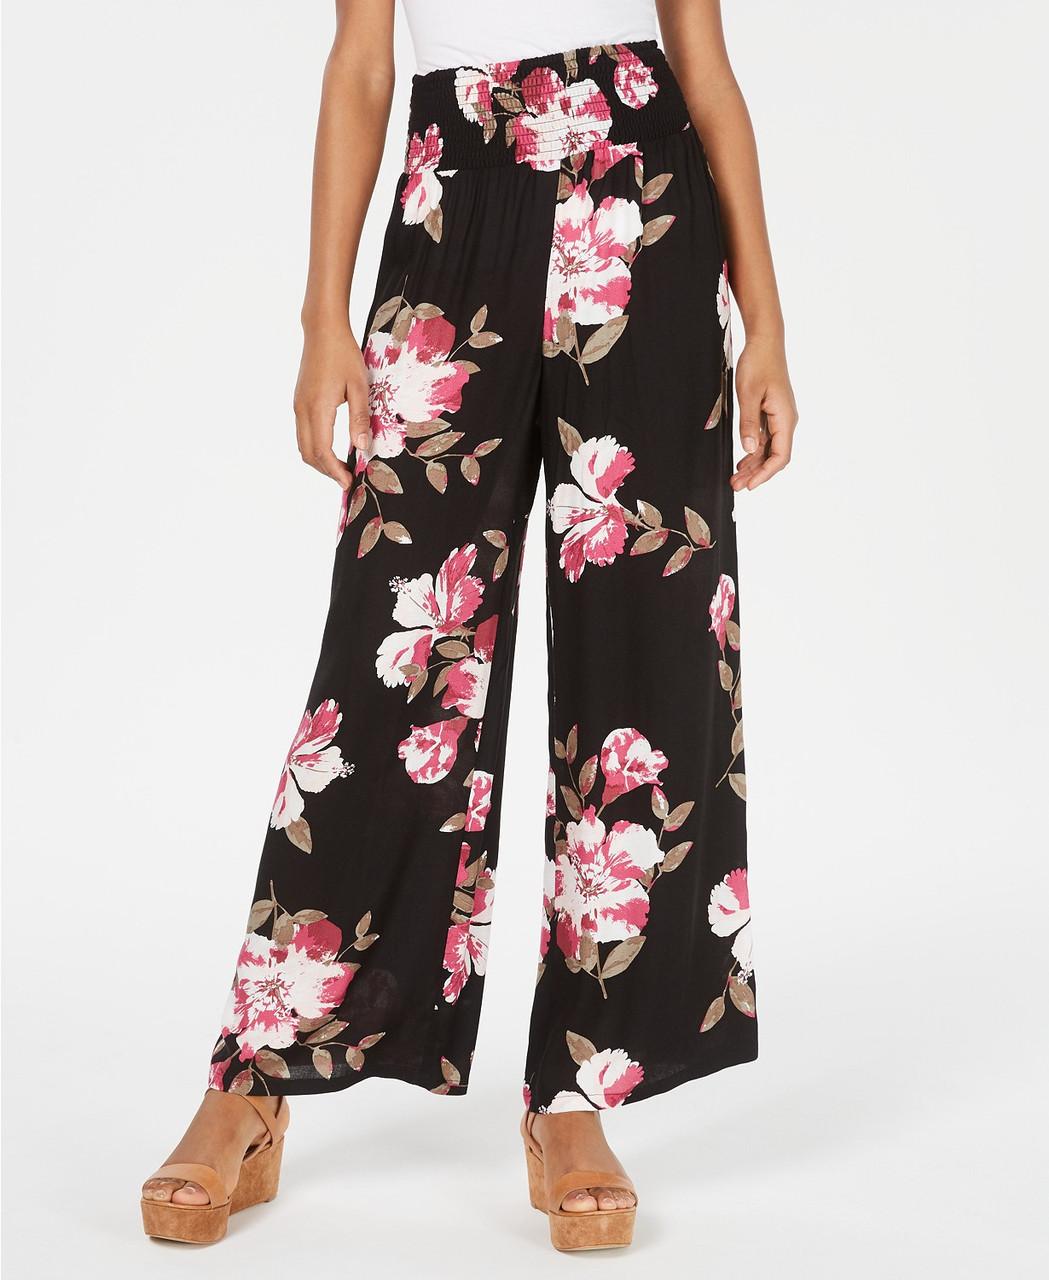 American Rag Женские брюки -Т1